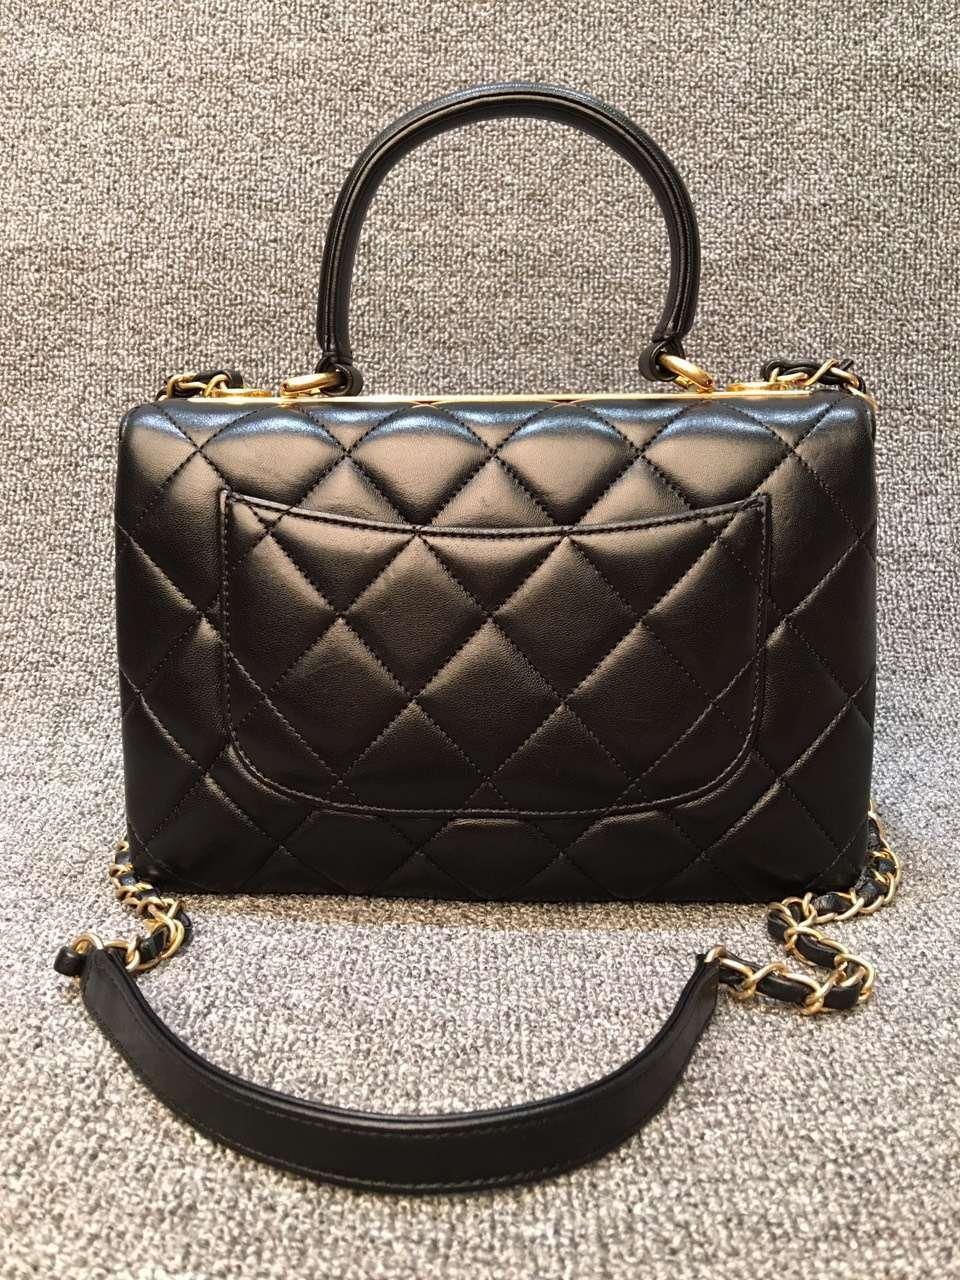 9f49411e39a5 Chanel Trendy CC Small Dual Handle Flap Bag — CONSIGNMENT BOULEVARD